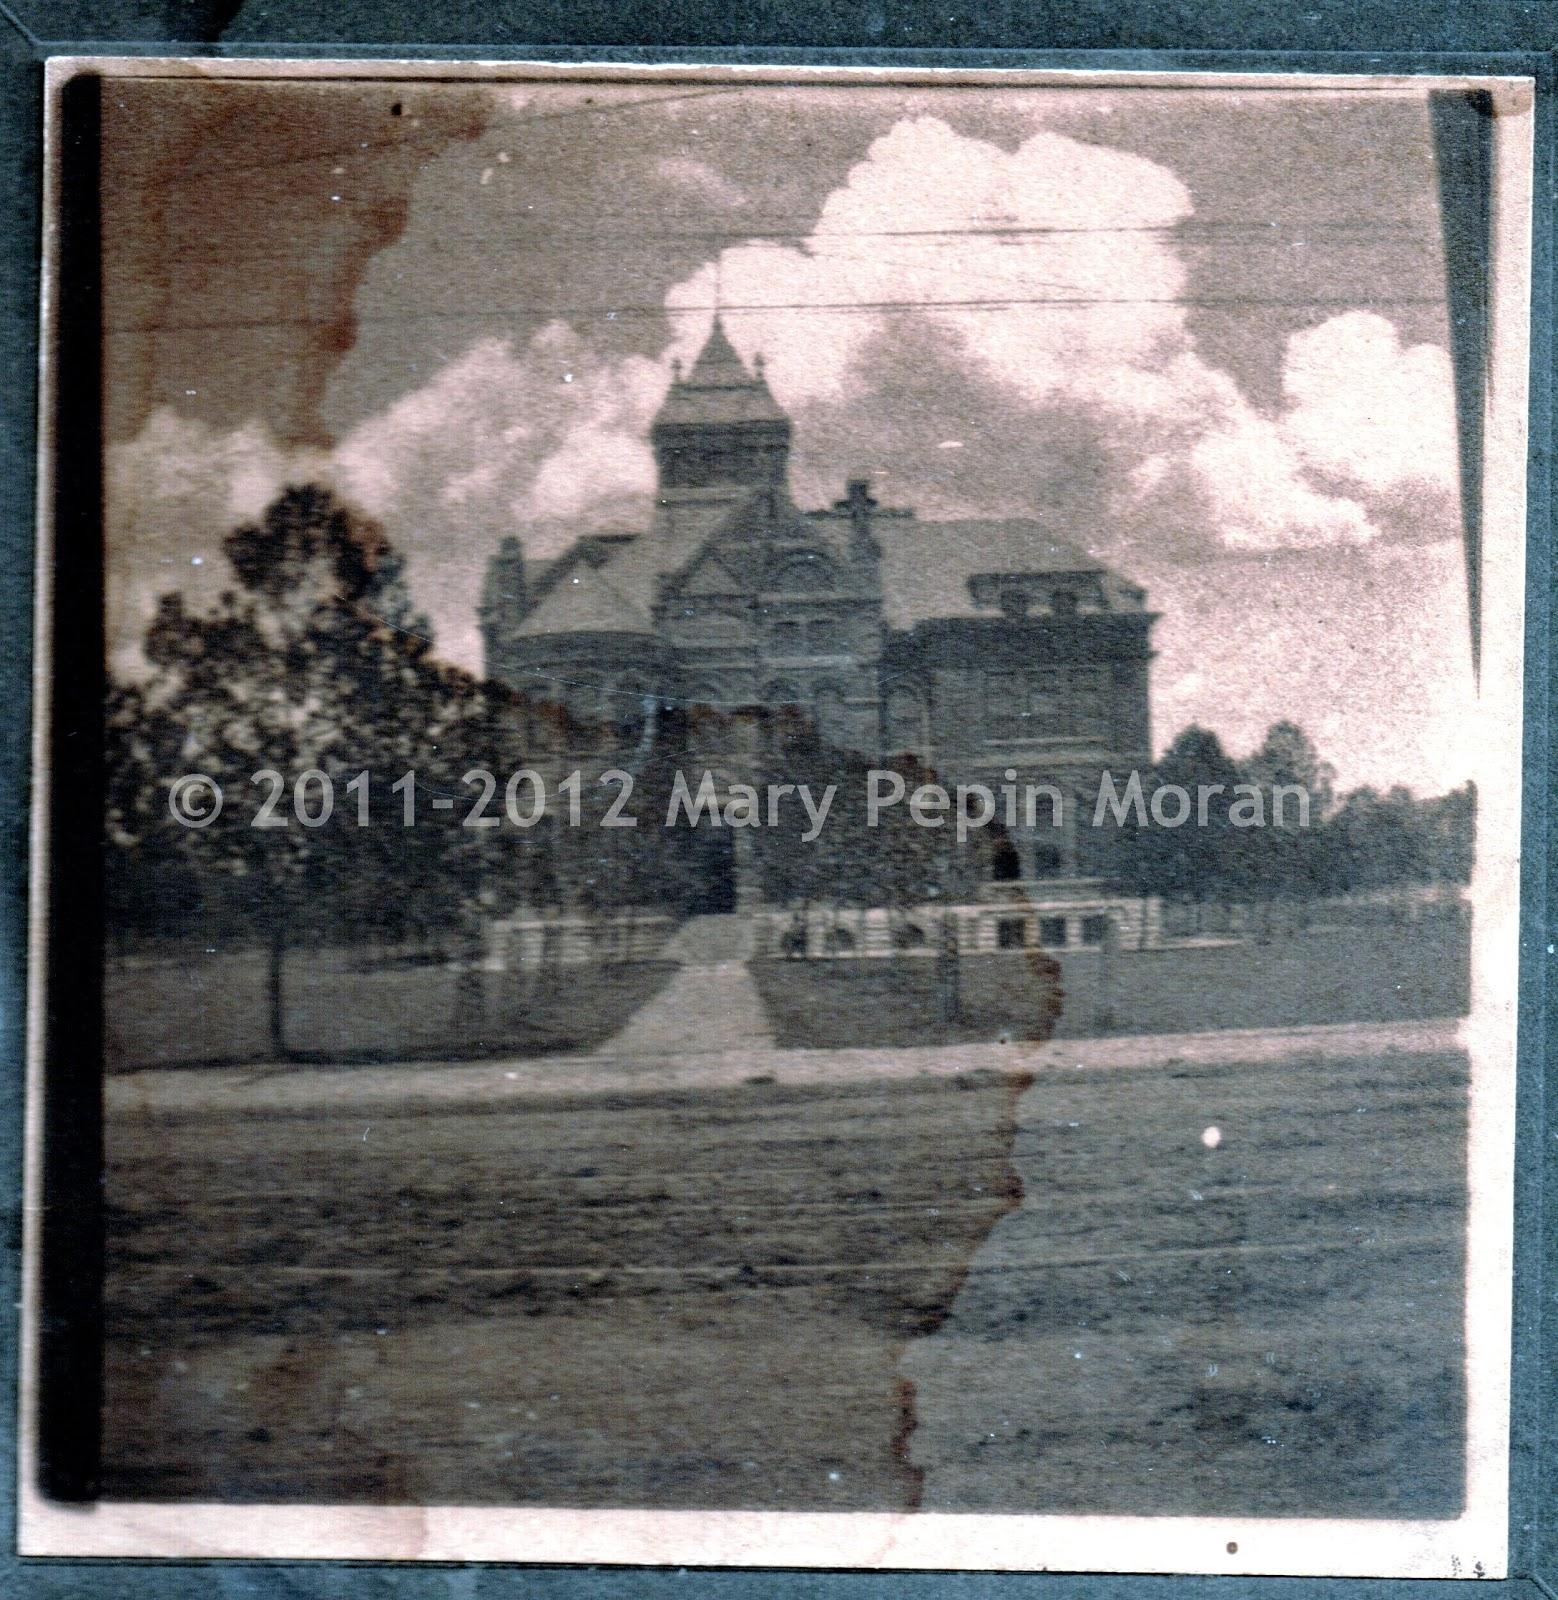 Moran Place ©: Fort Worth TX Landmarks Ca. 1900